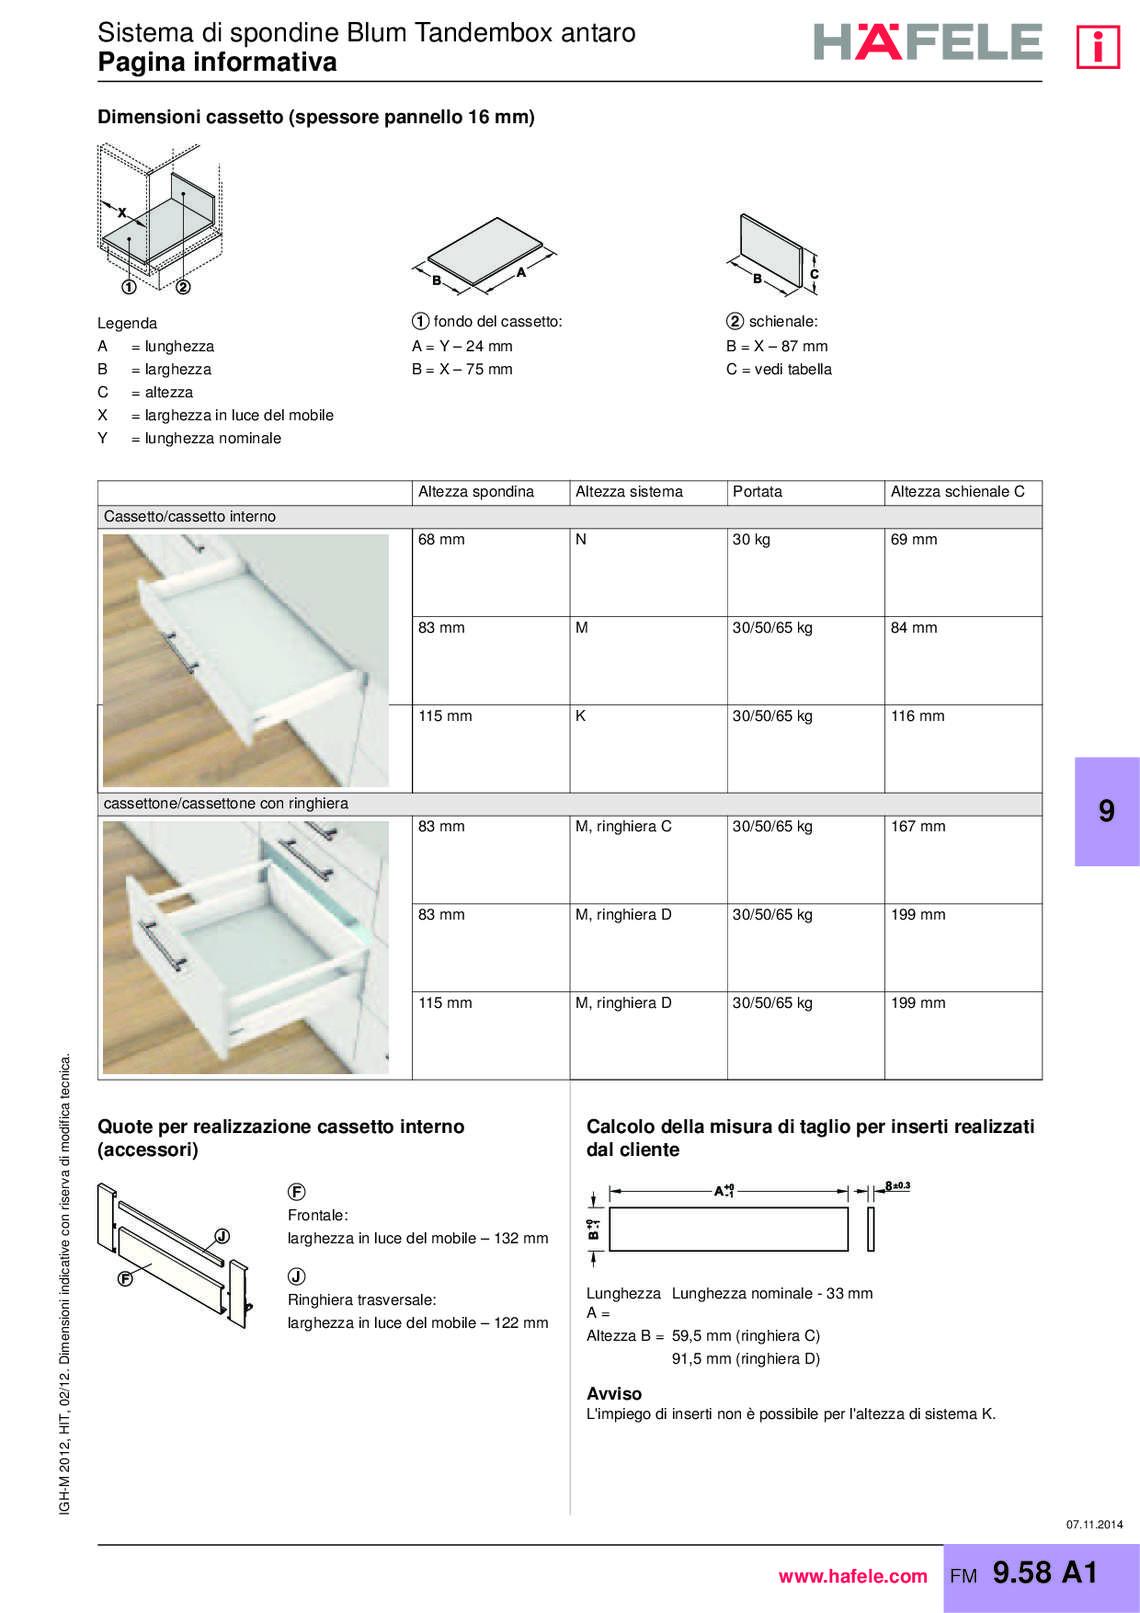 hafele-spondine-e-guide-per-mobili_40_072.jpg